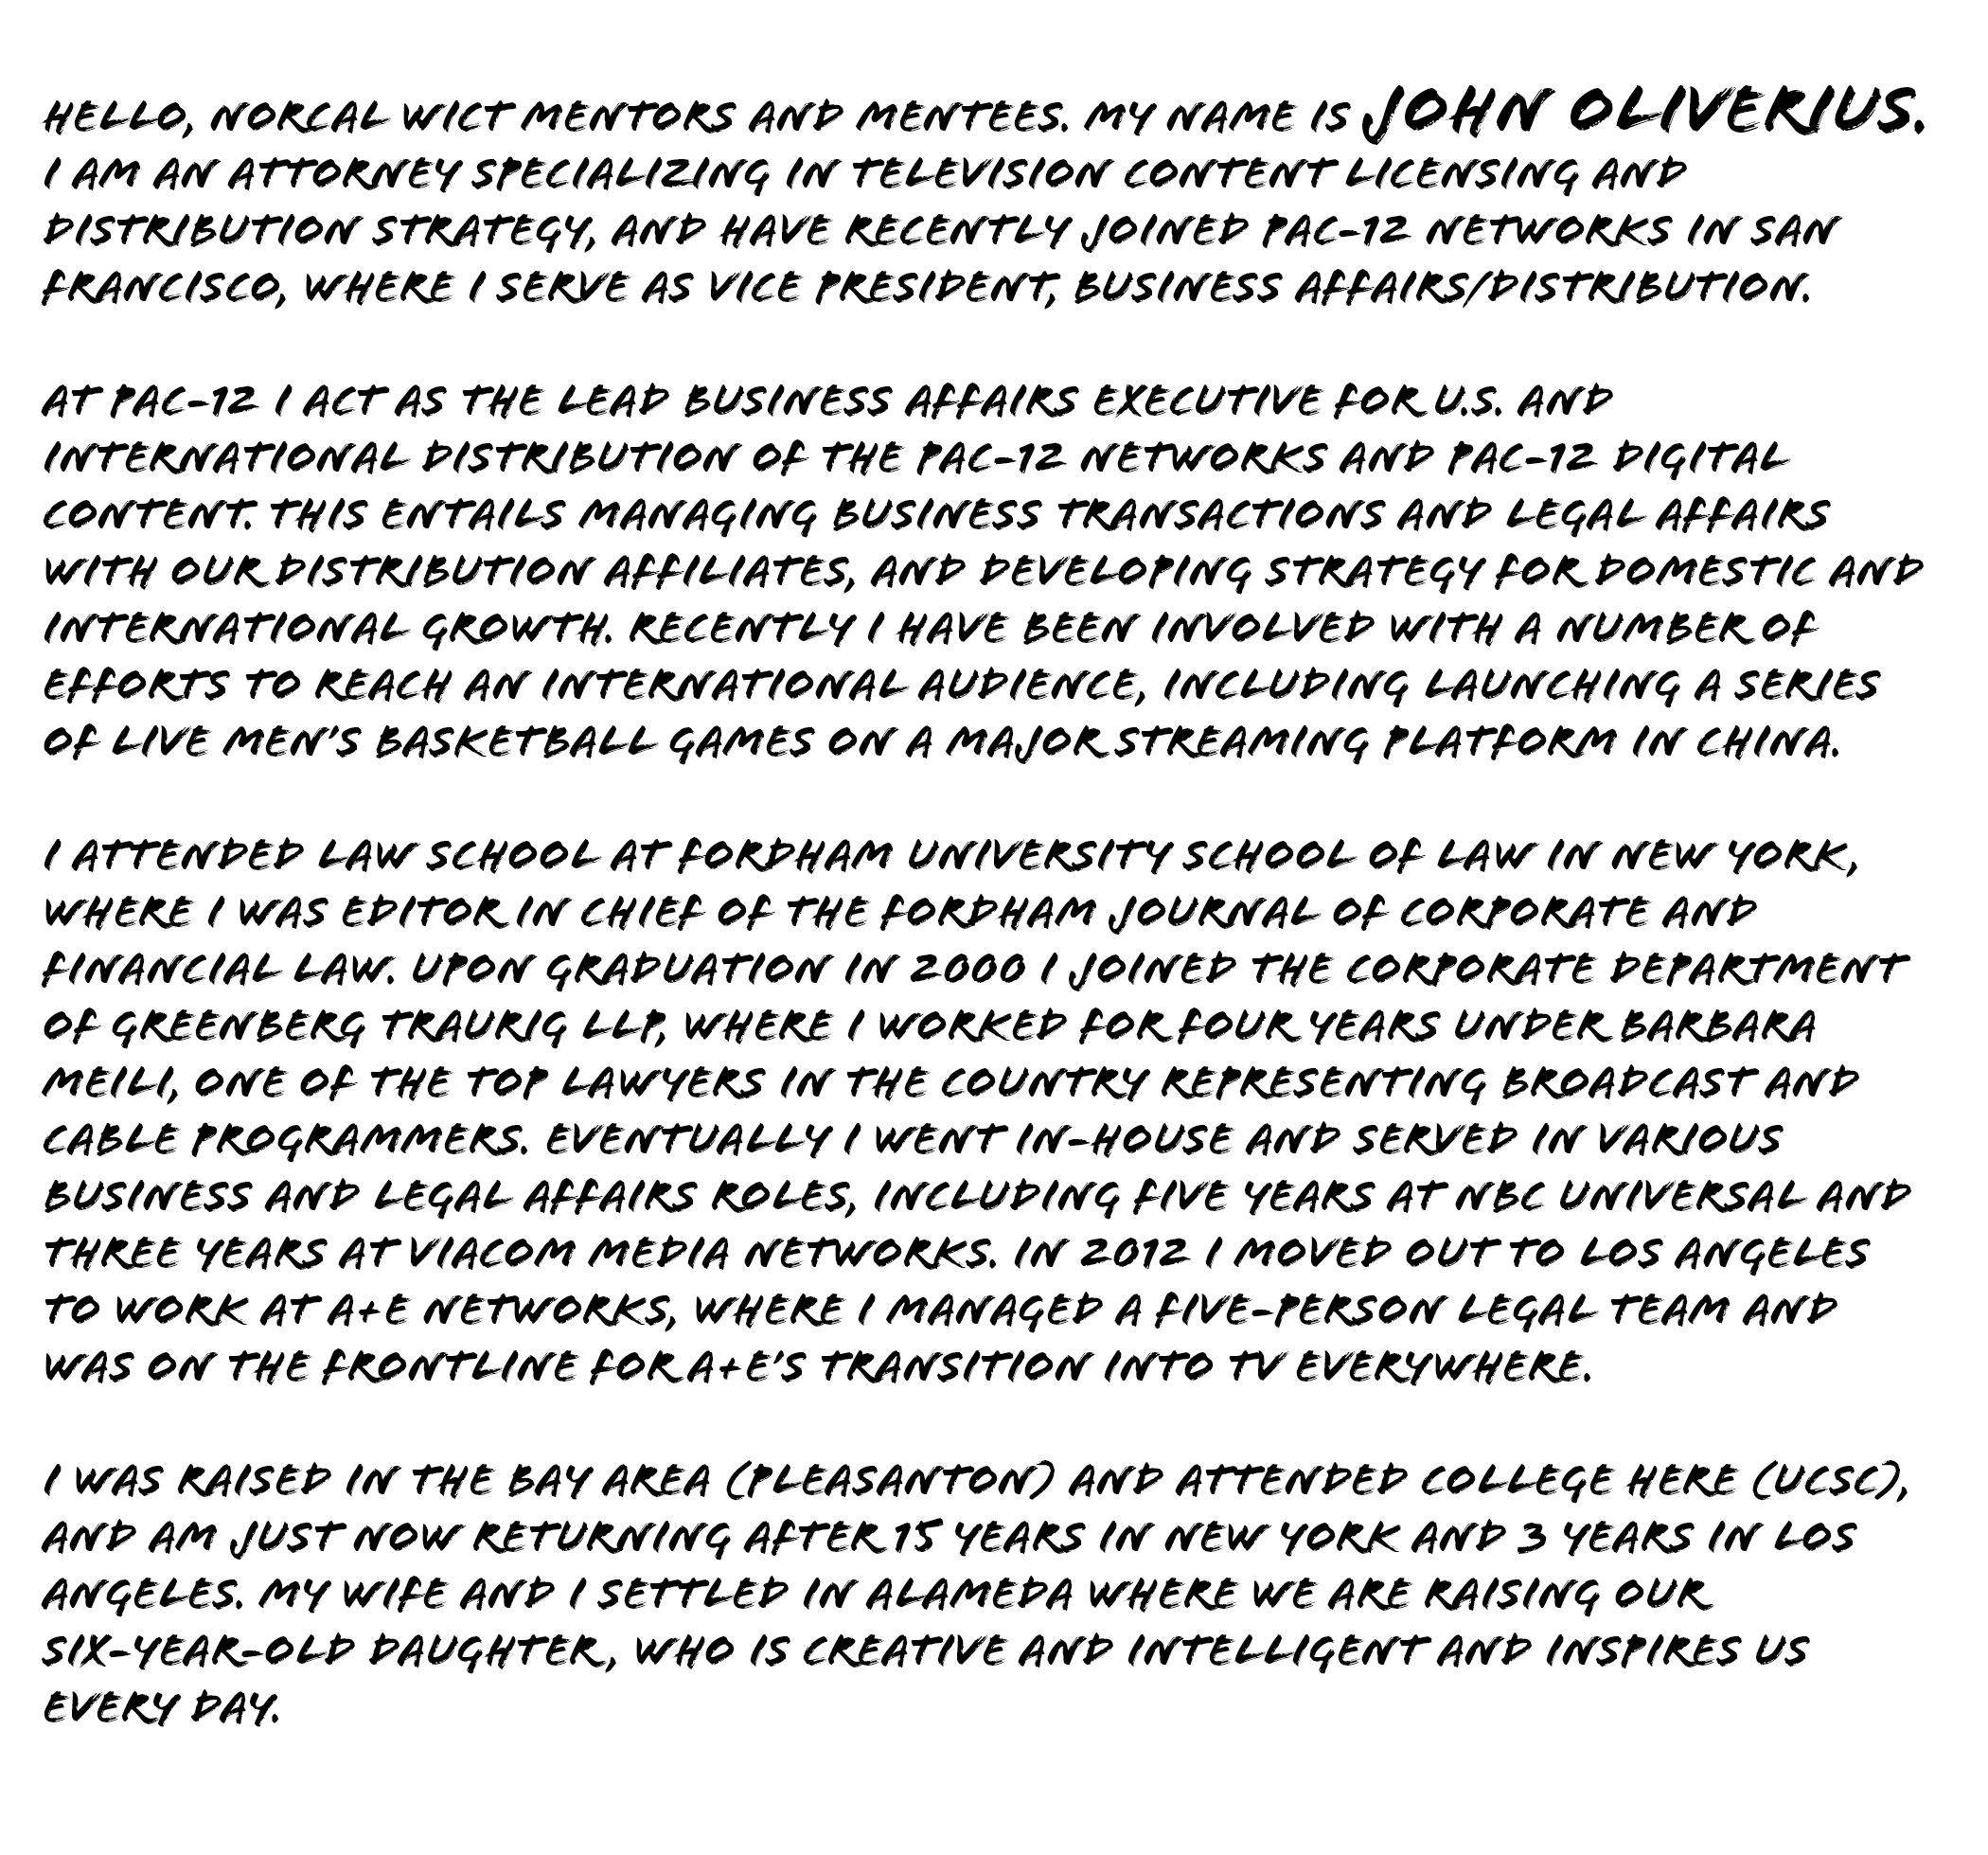 John Oliverus.jpg